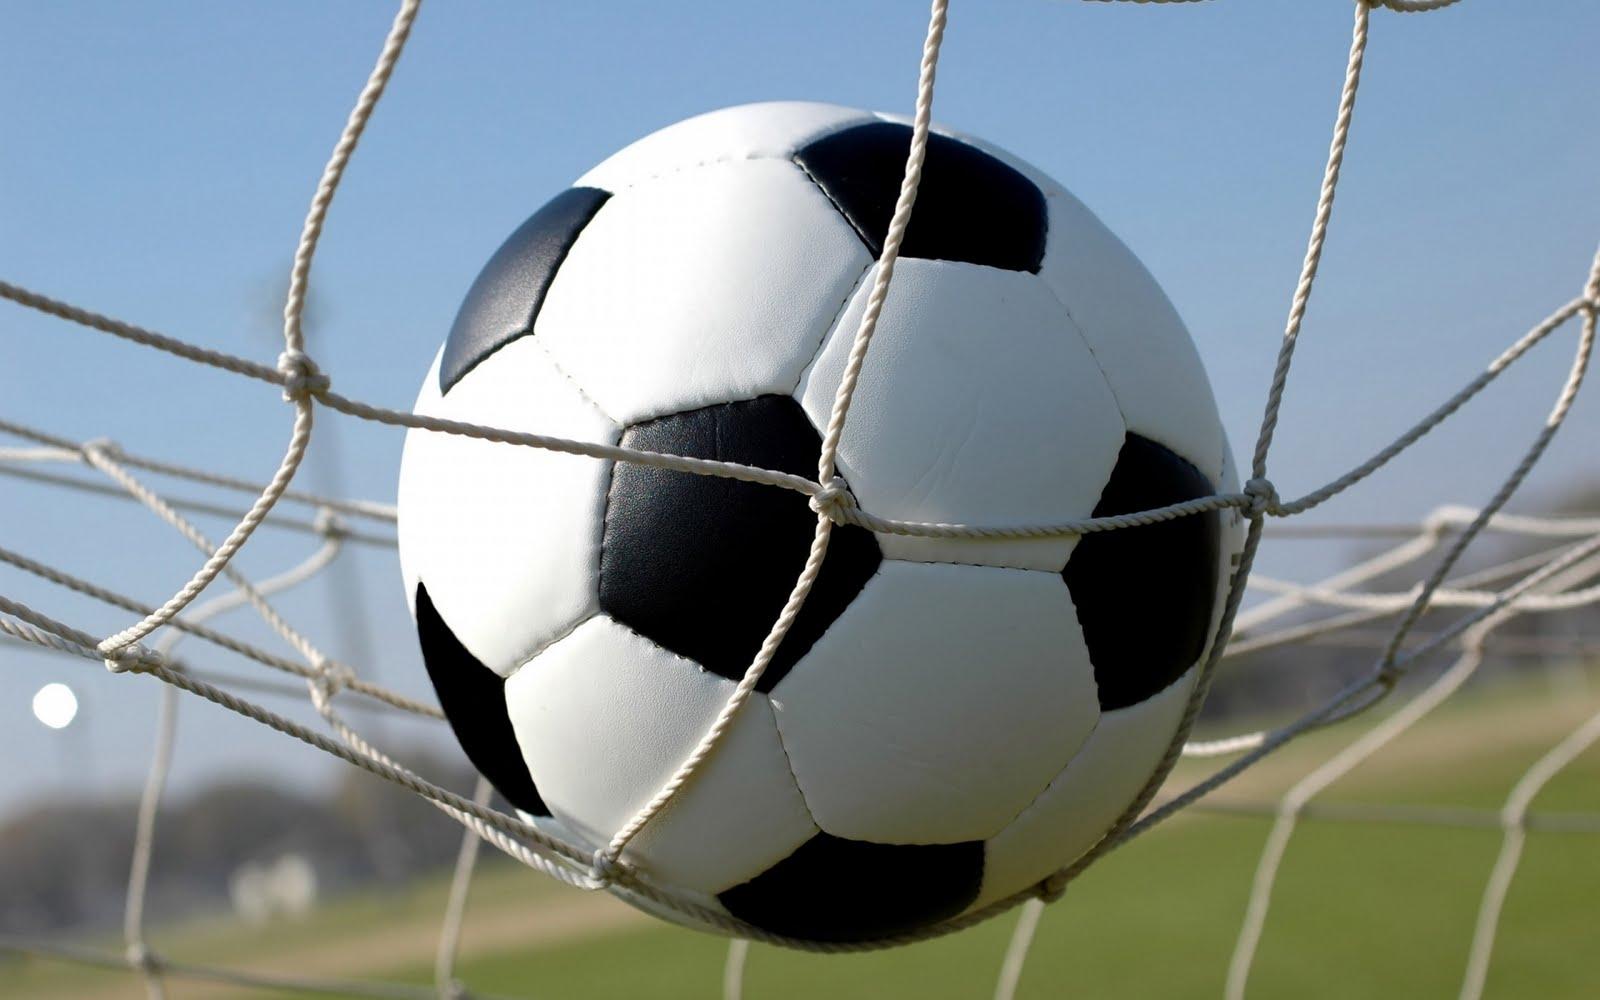 Football Wallpaper: Soccer Ball Wallpapers, Soccer Ball